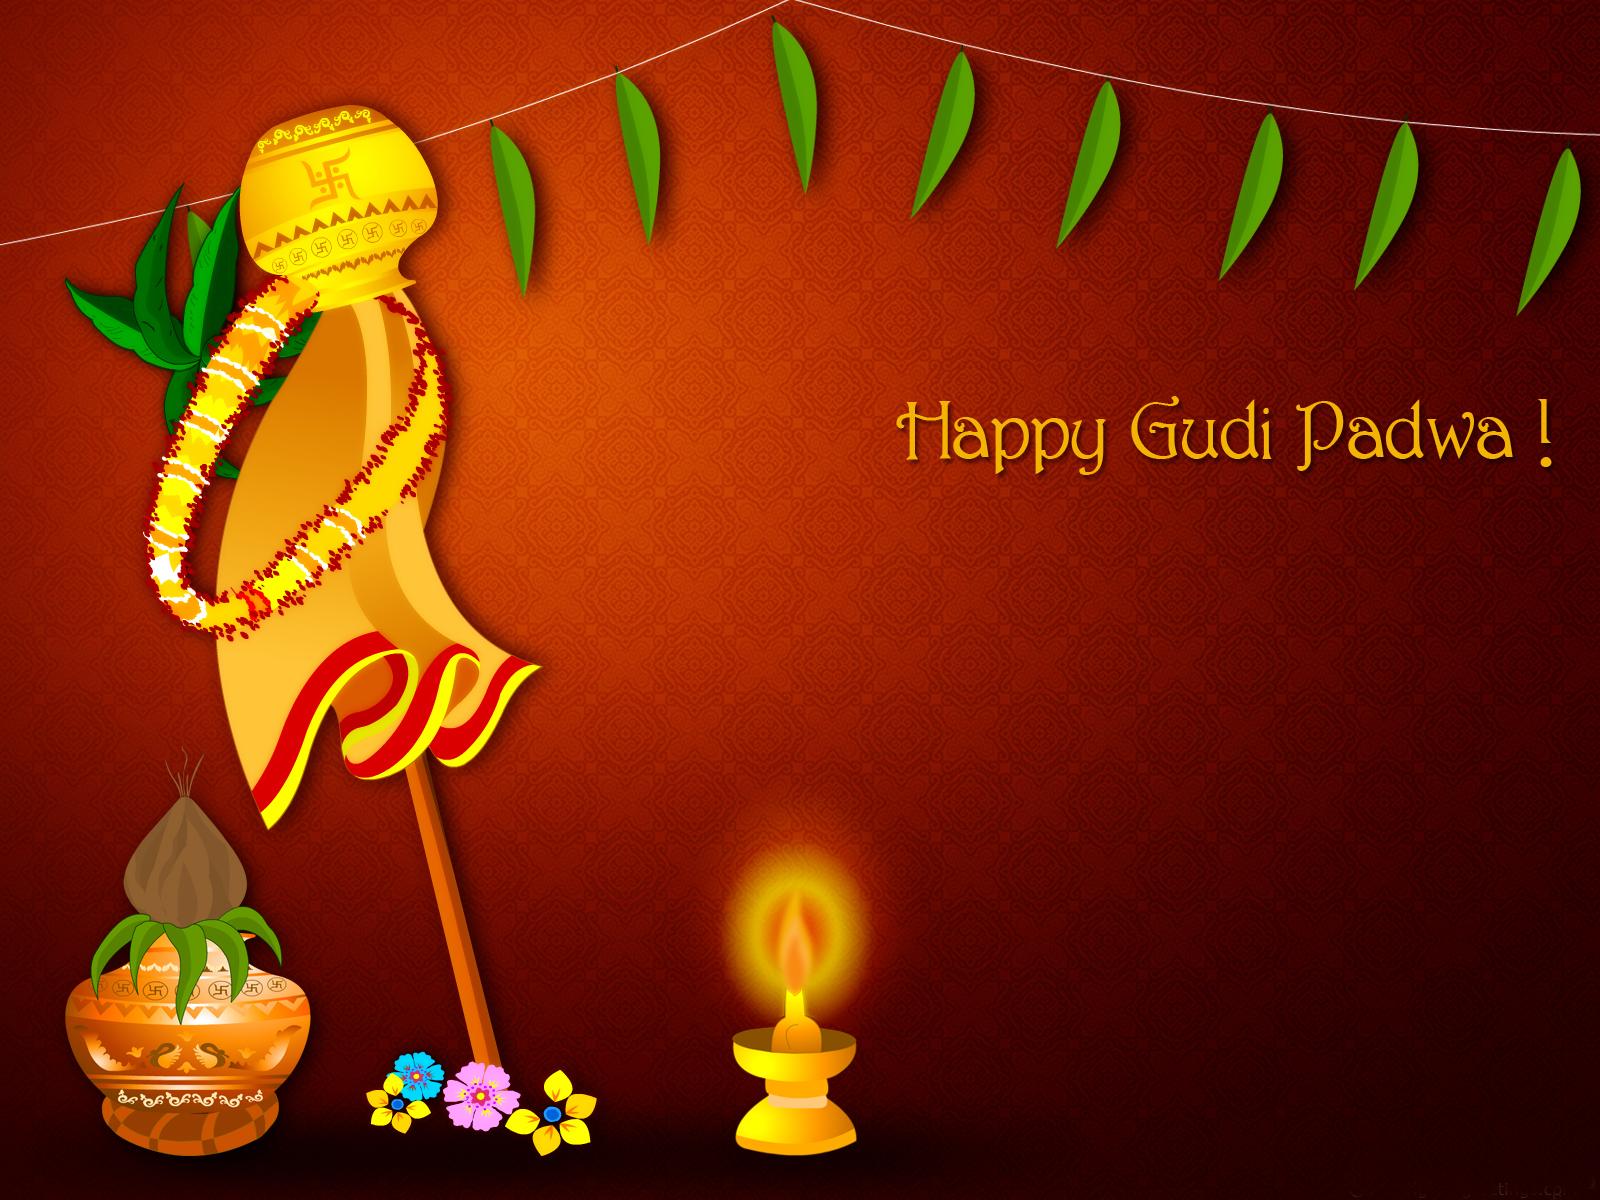 Happy Diwali Wallpaper Quotes In Hindi Gudi Padwa Images Gif Hd Pics Amp Photos 2019 Free For